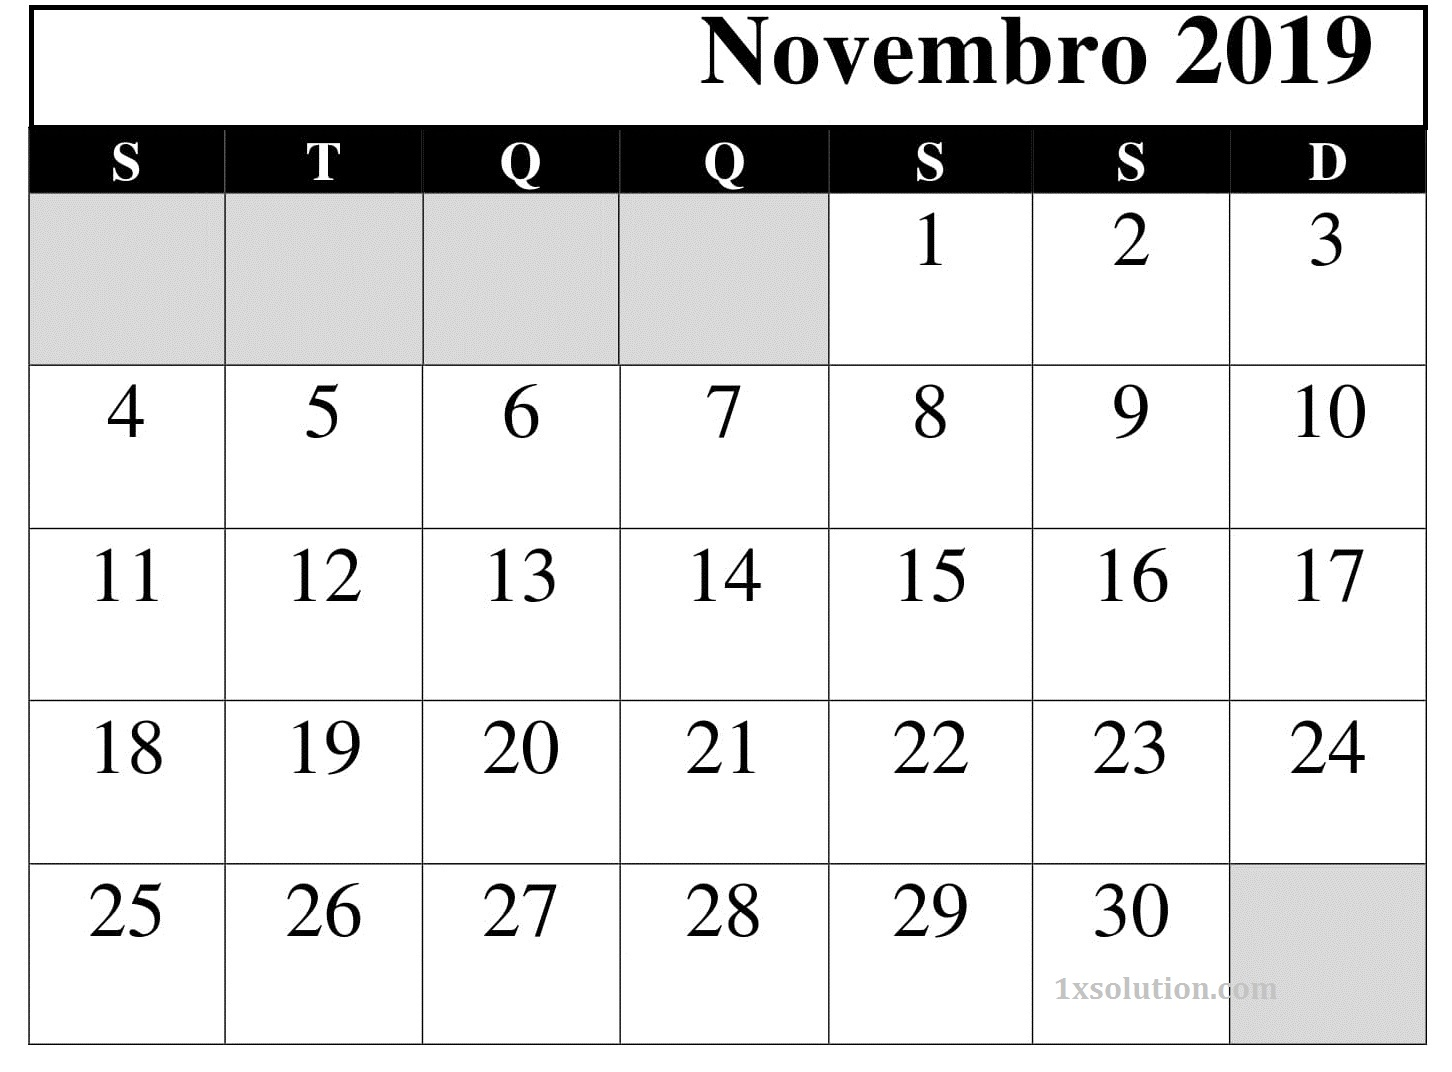 Vertical Calendário 2019 Novembro